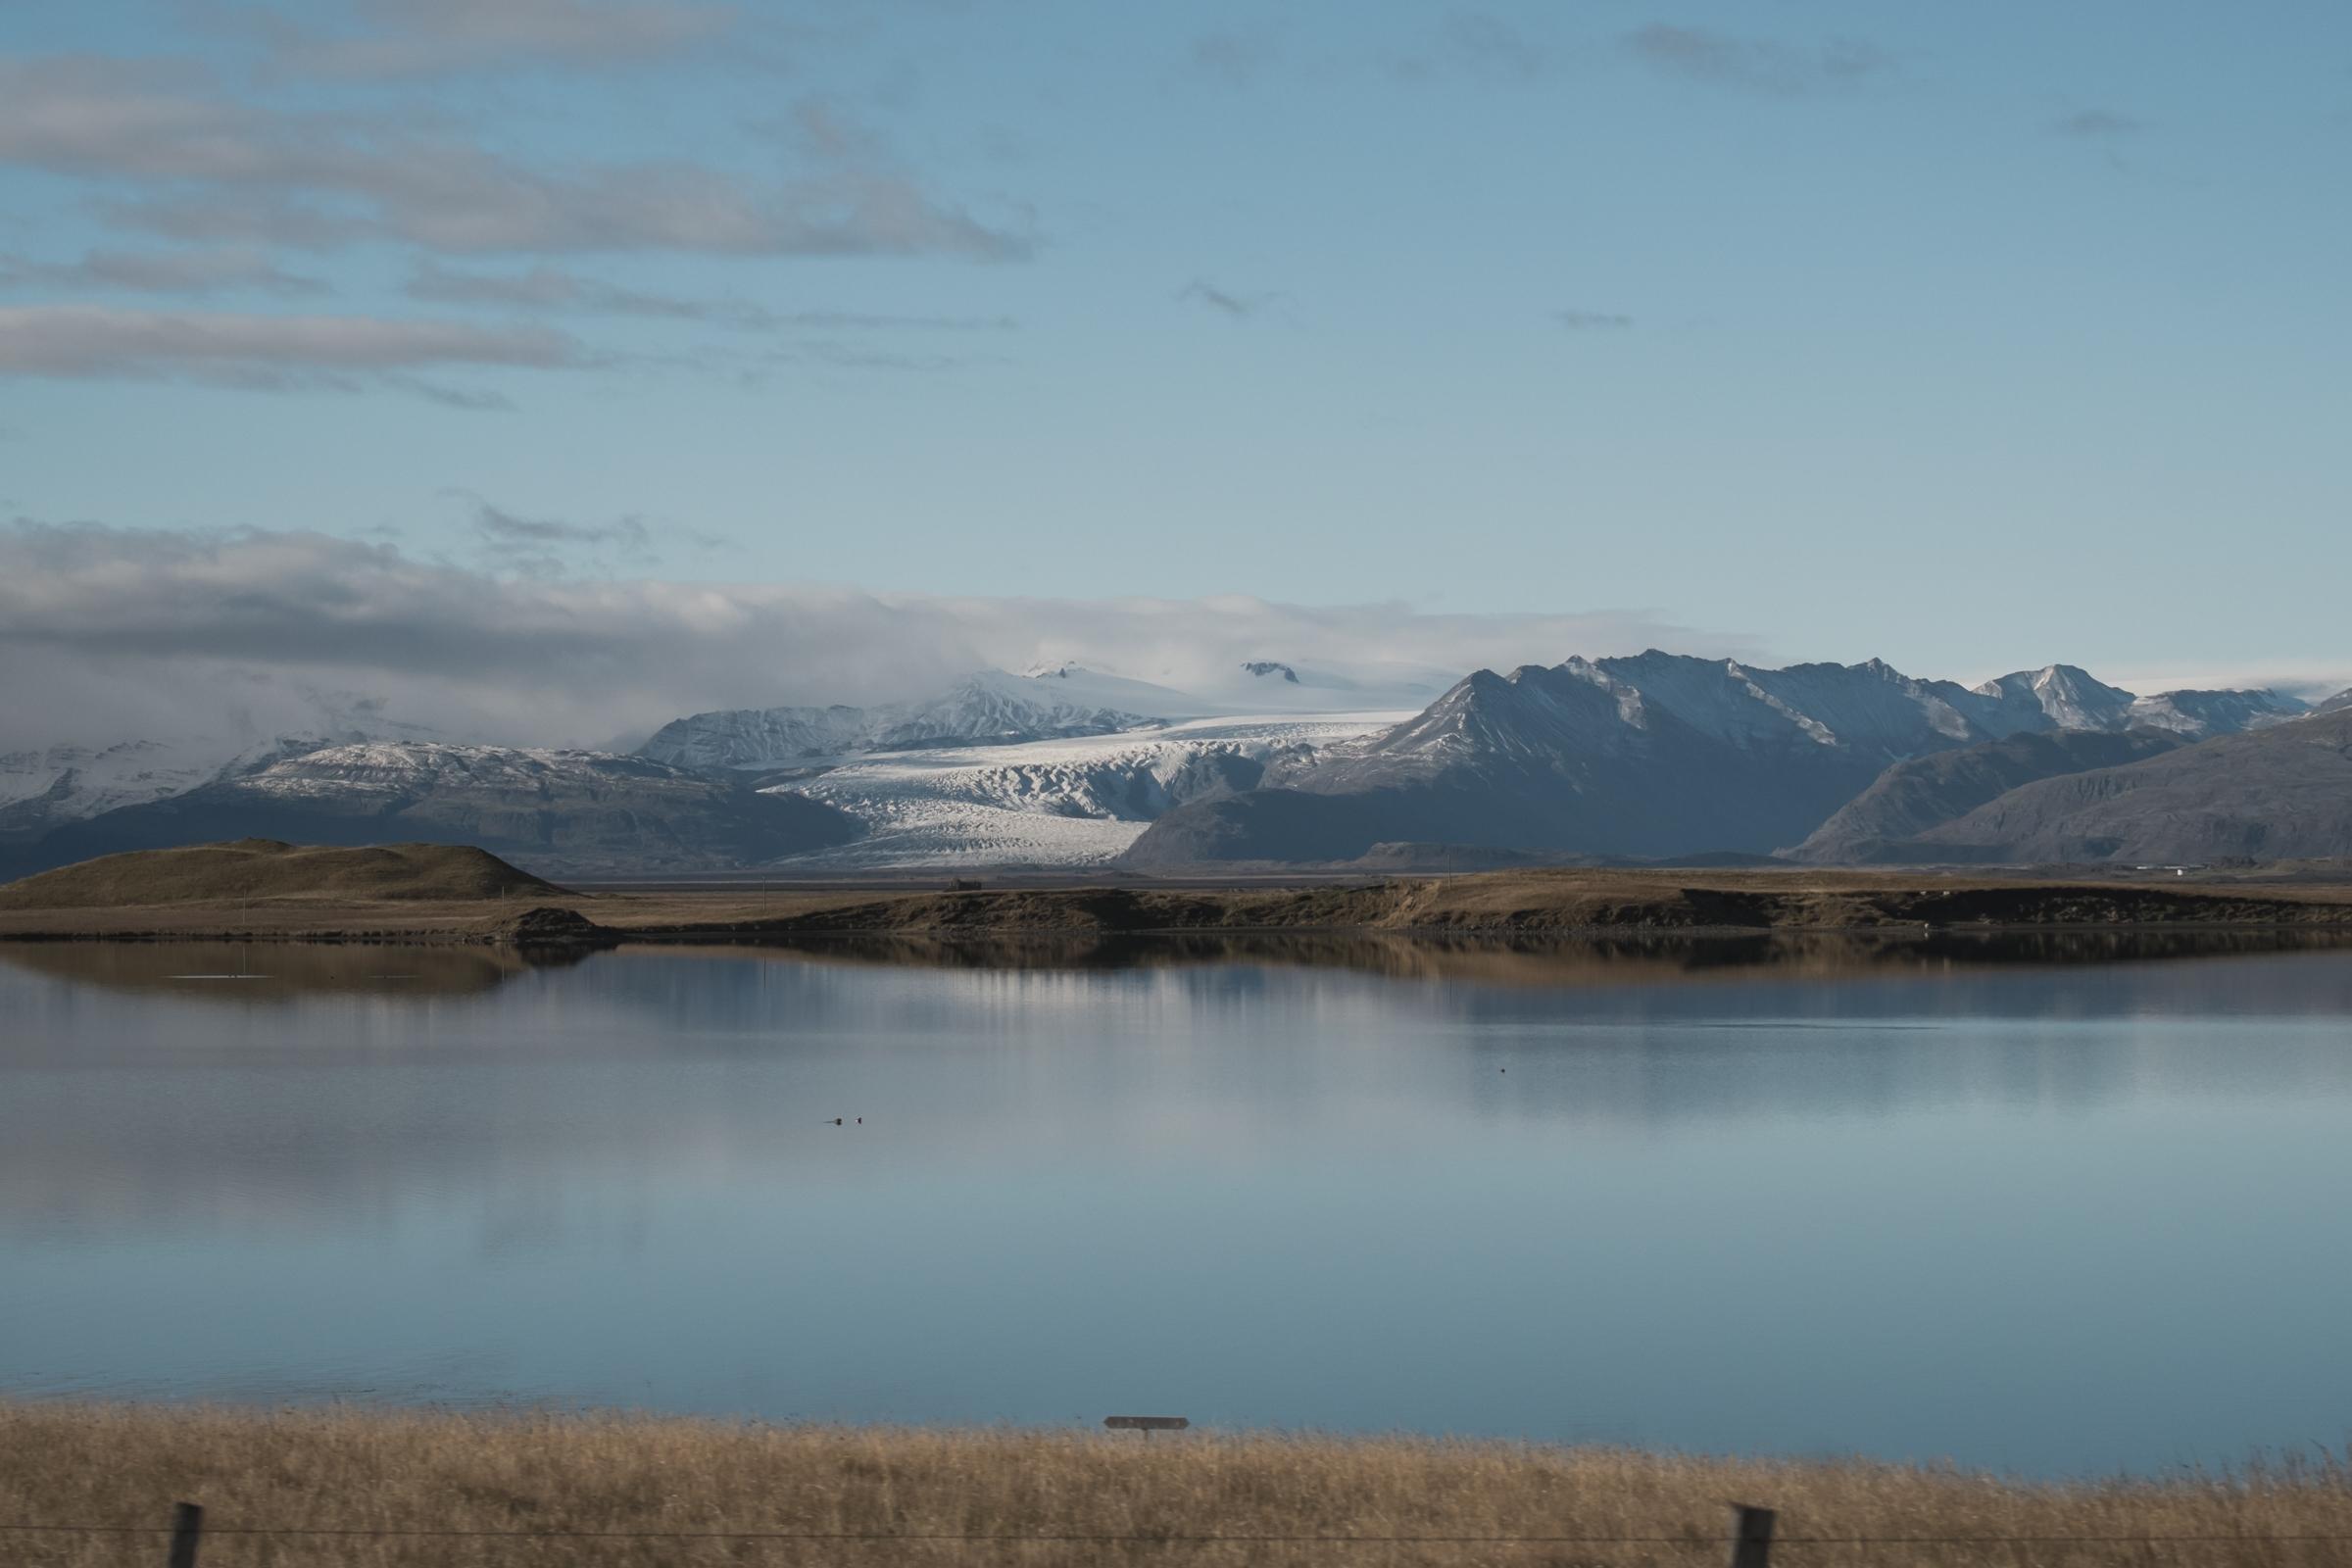 20131007-050-Iceland_Travel_Editorial.jpg